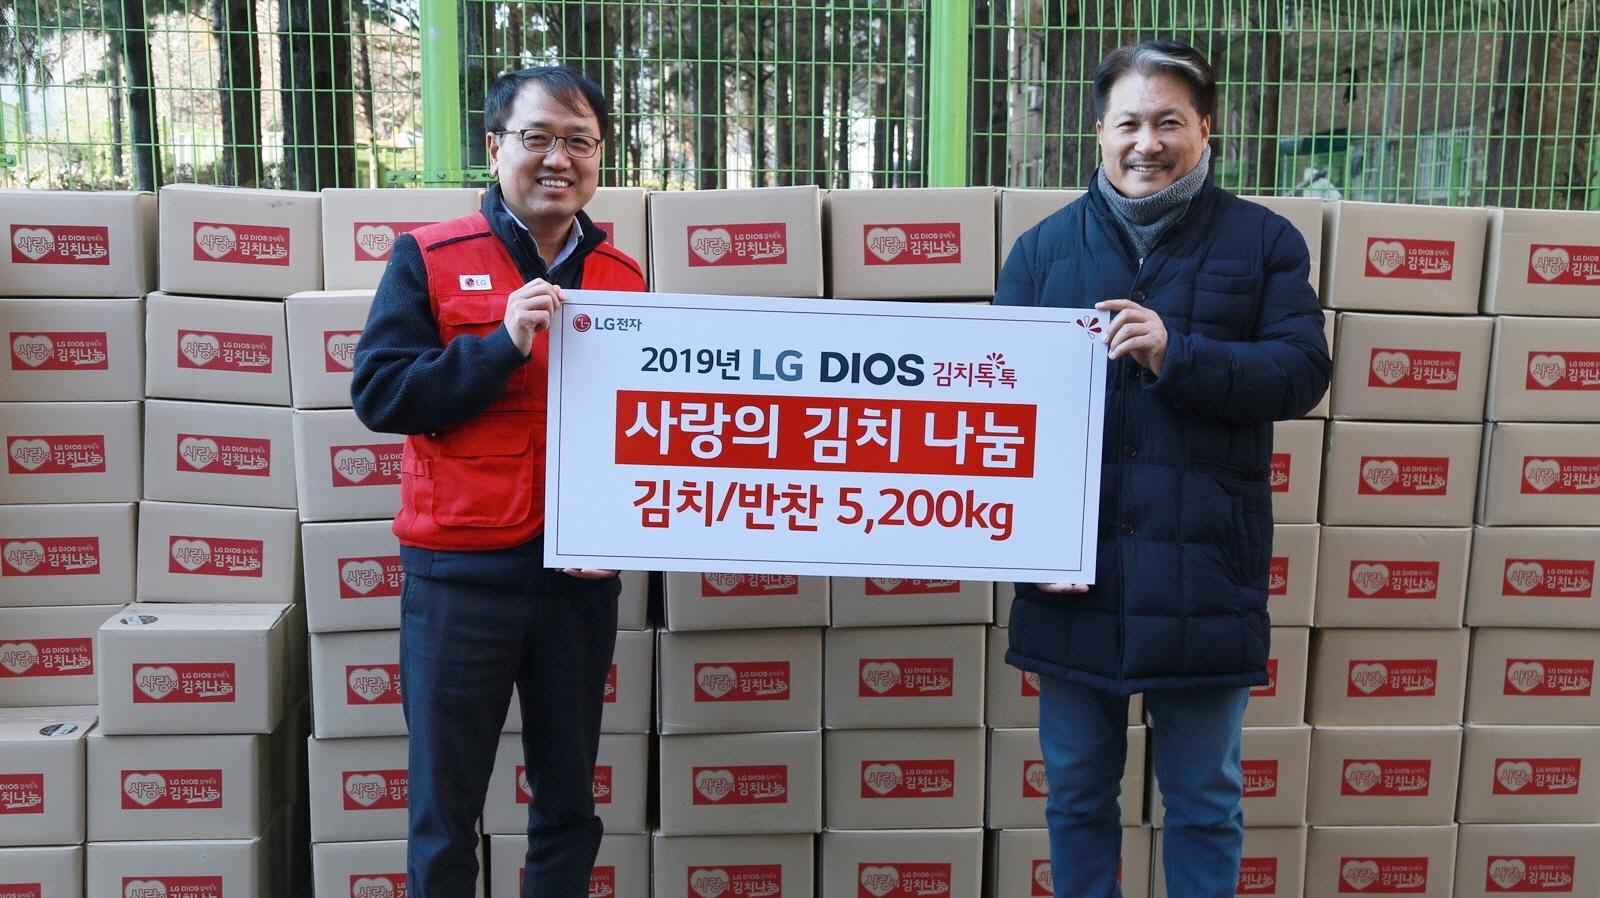 'LG 디오스 김치톡톡'과 함께 소외계층에 온정(溫情) 나눠